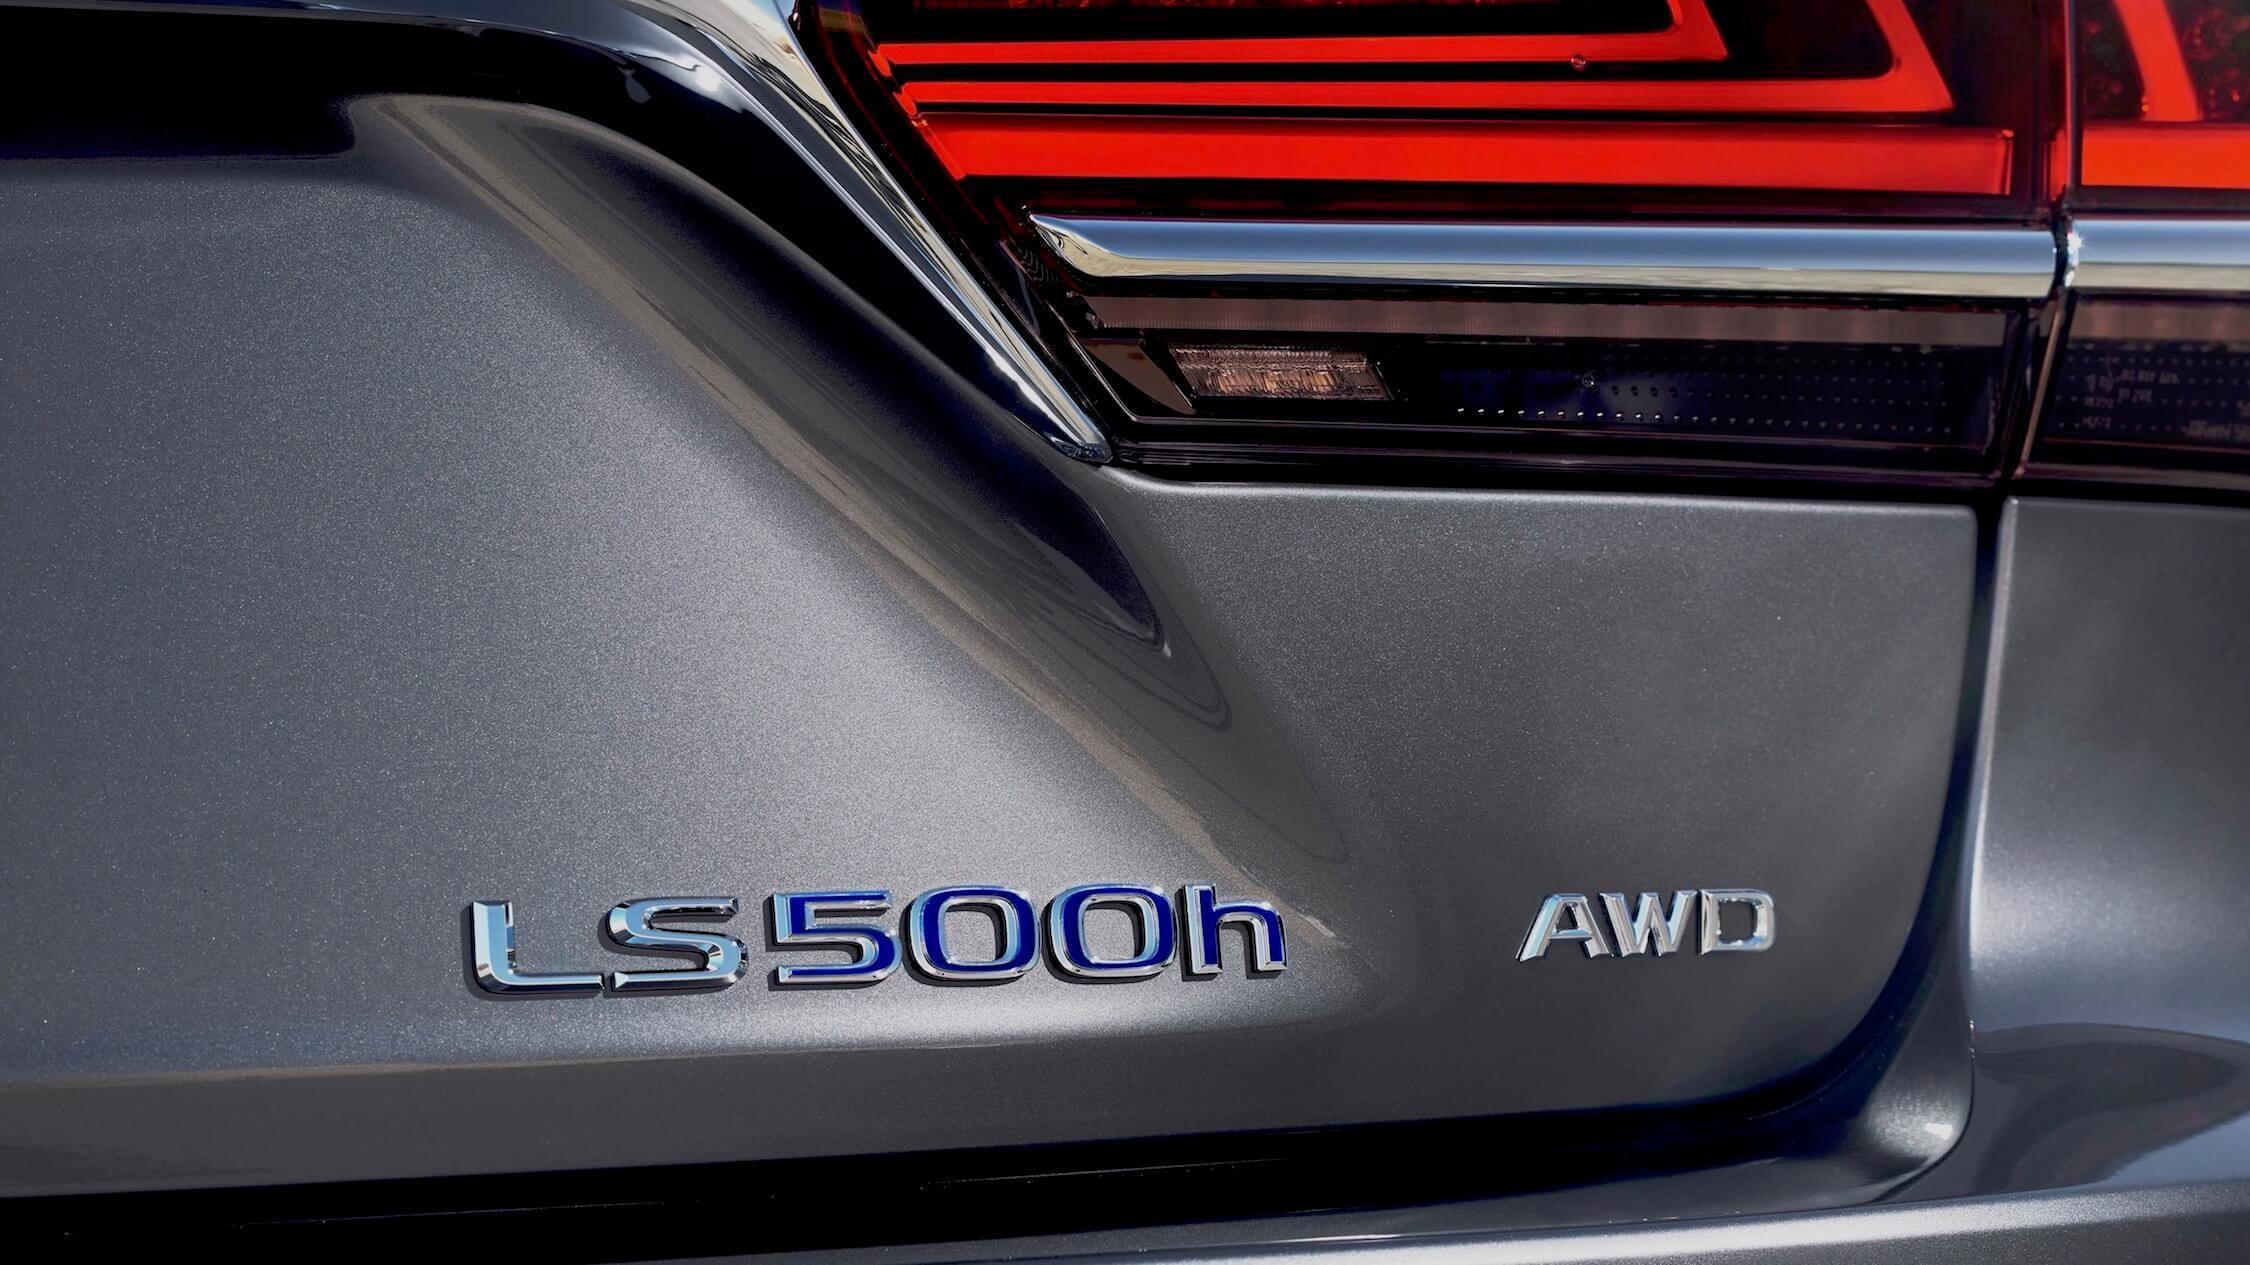 Lexus LS 500h logo